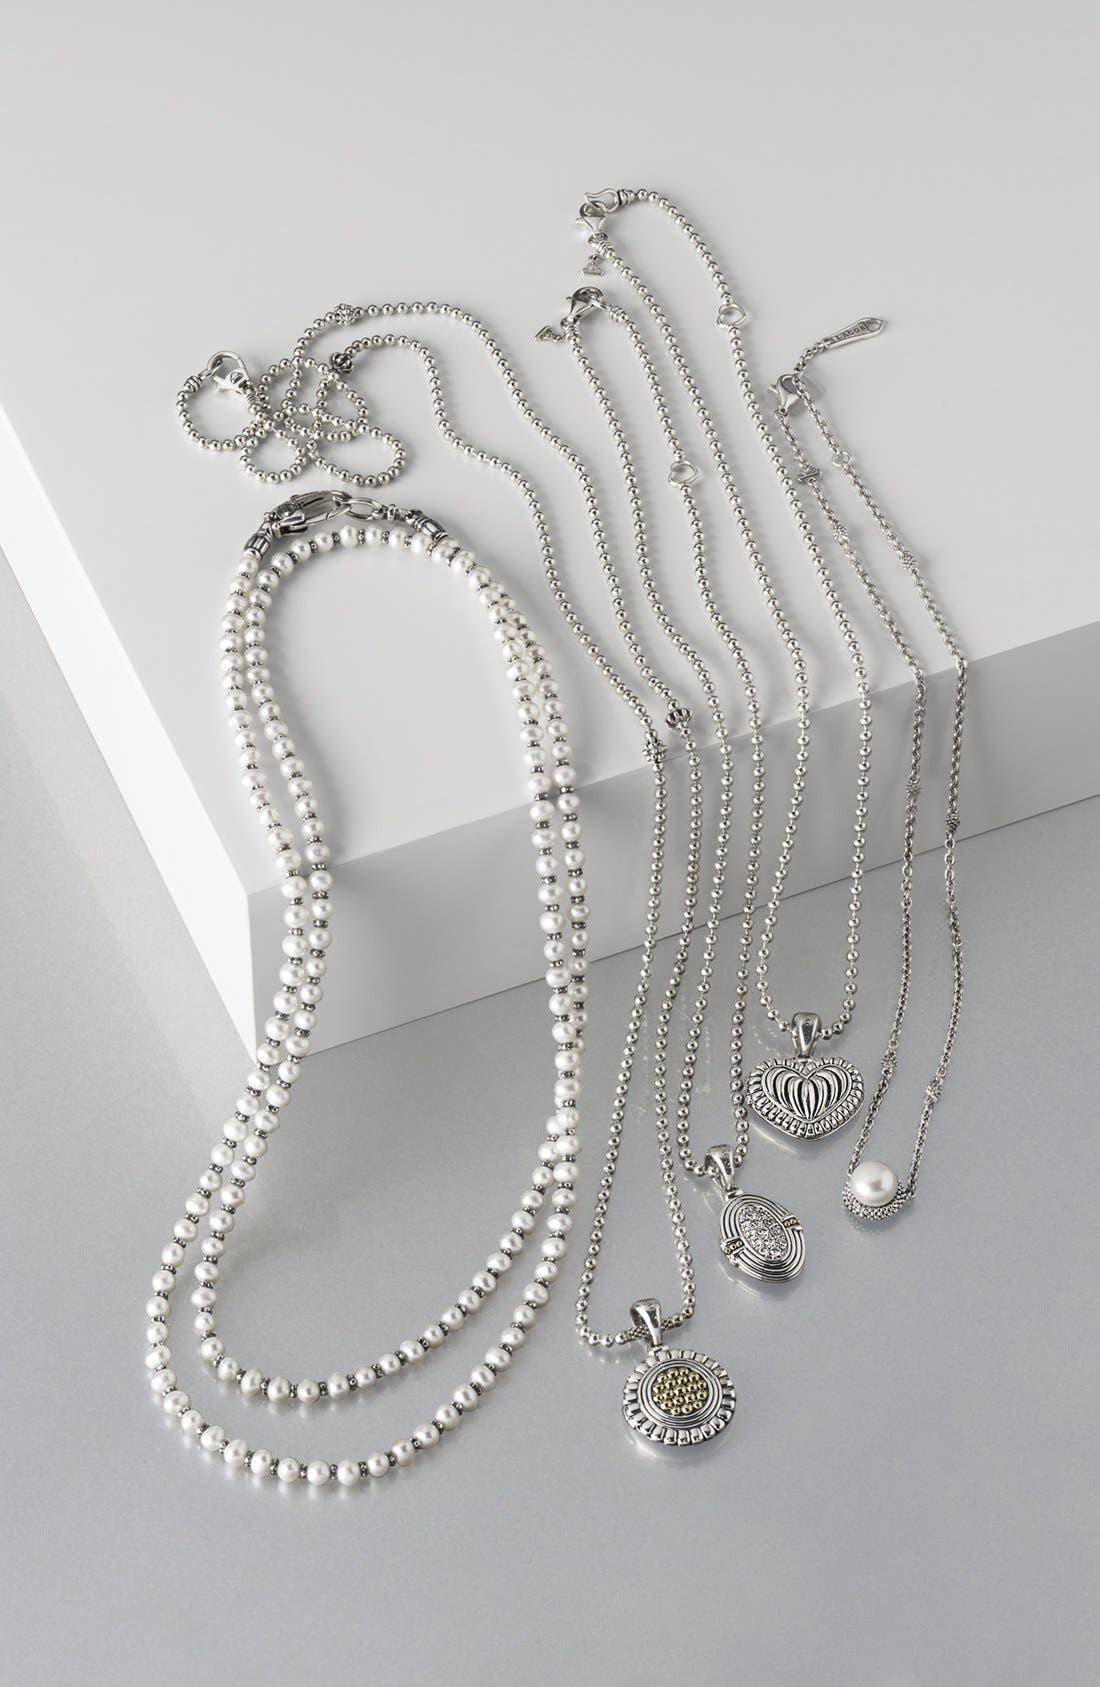 Beloved Locket Pendant Necklace,                             Alternate thumbnail 5, color,                             SILVER/ GOLD